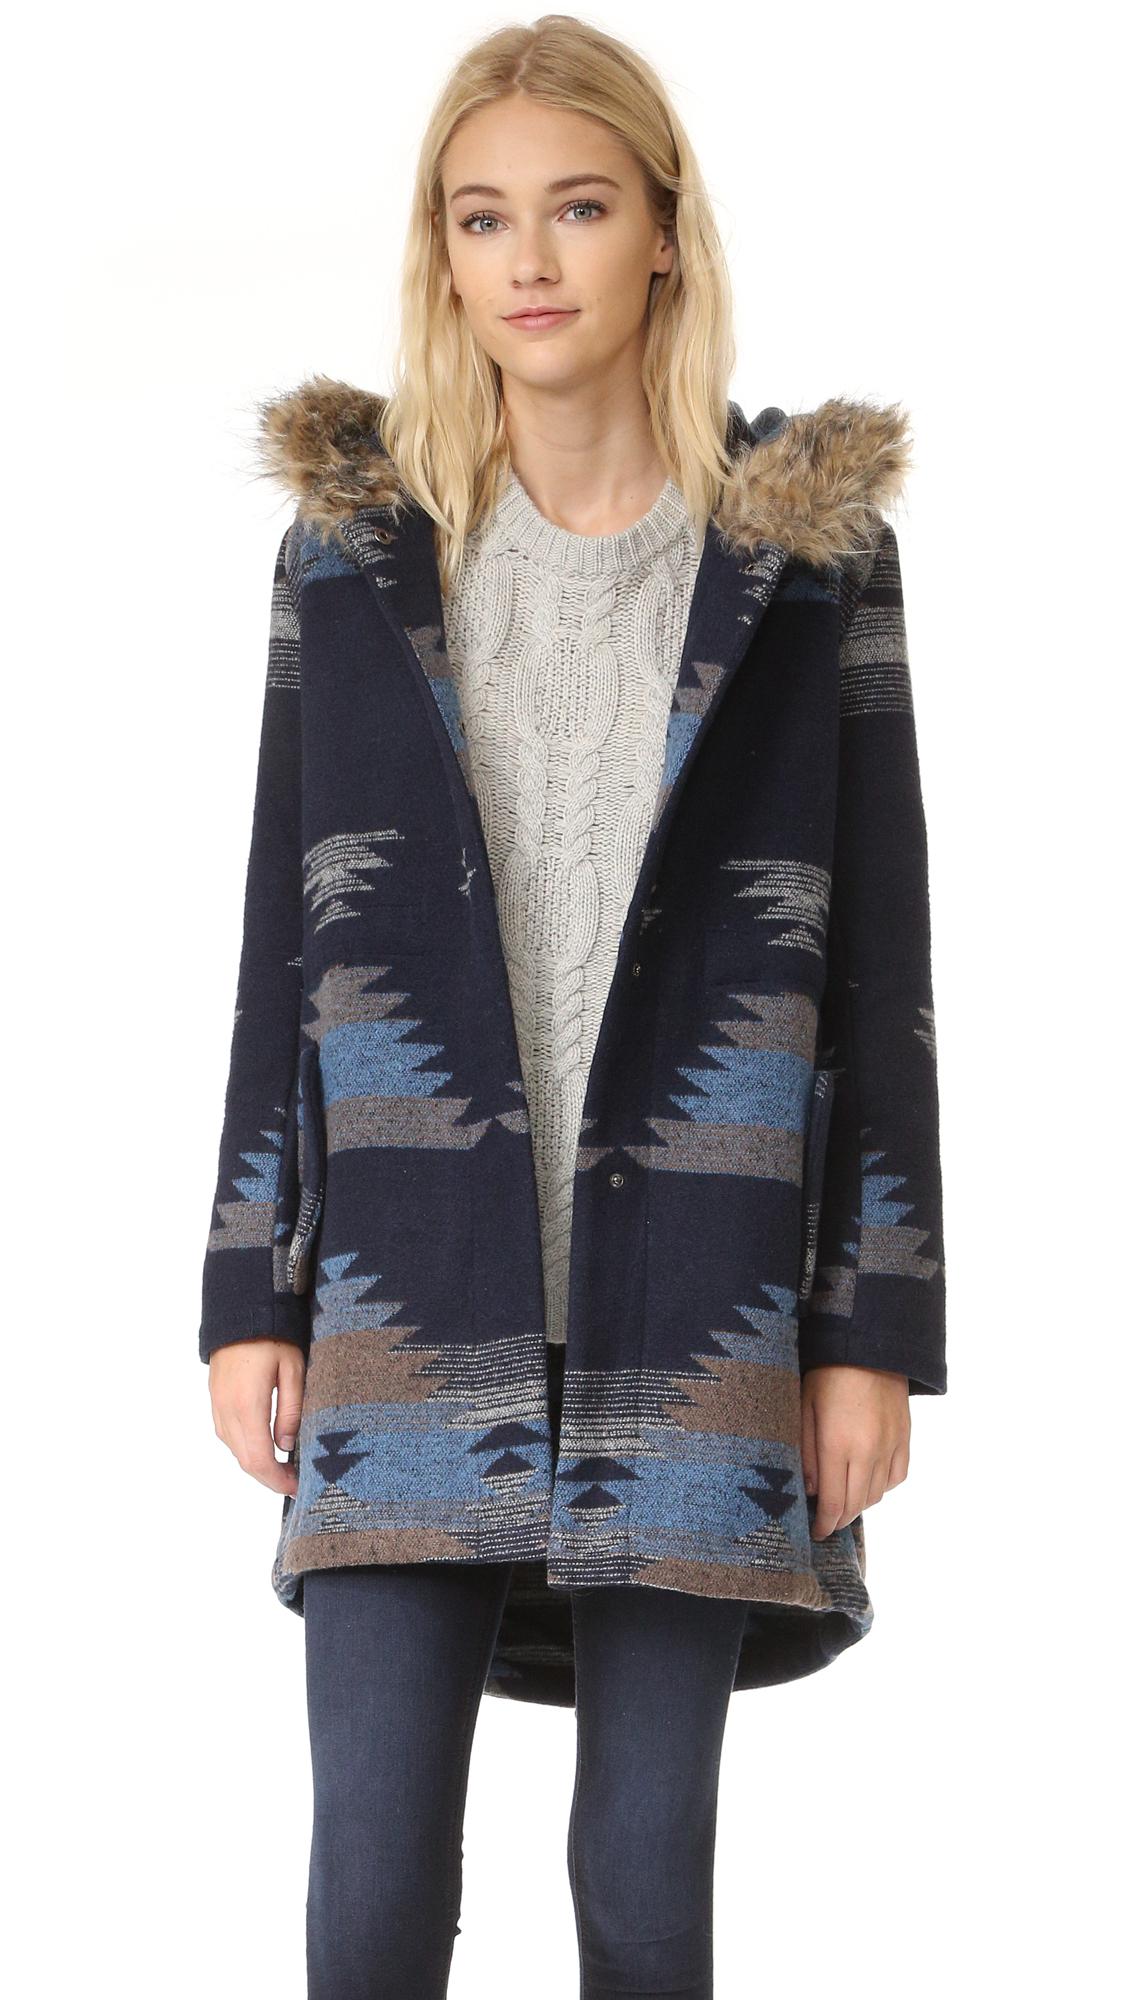 BB Dakota Dalley Tribal Pattern Hooded Coat  fc6ead411d1a4